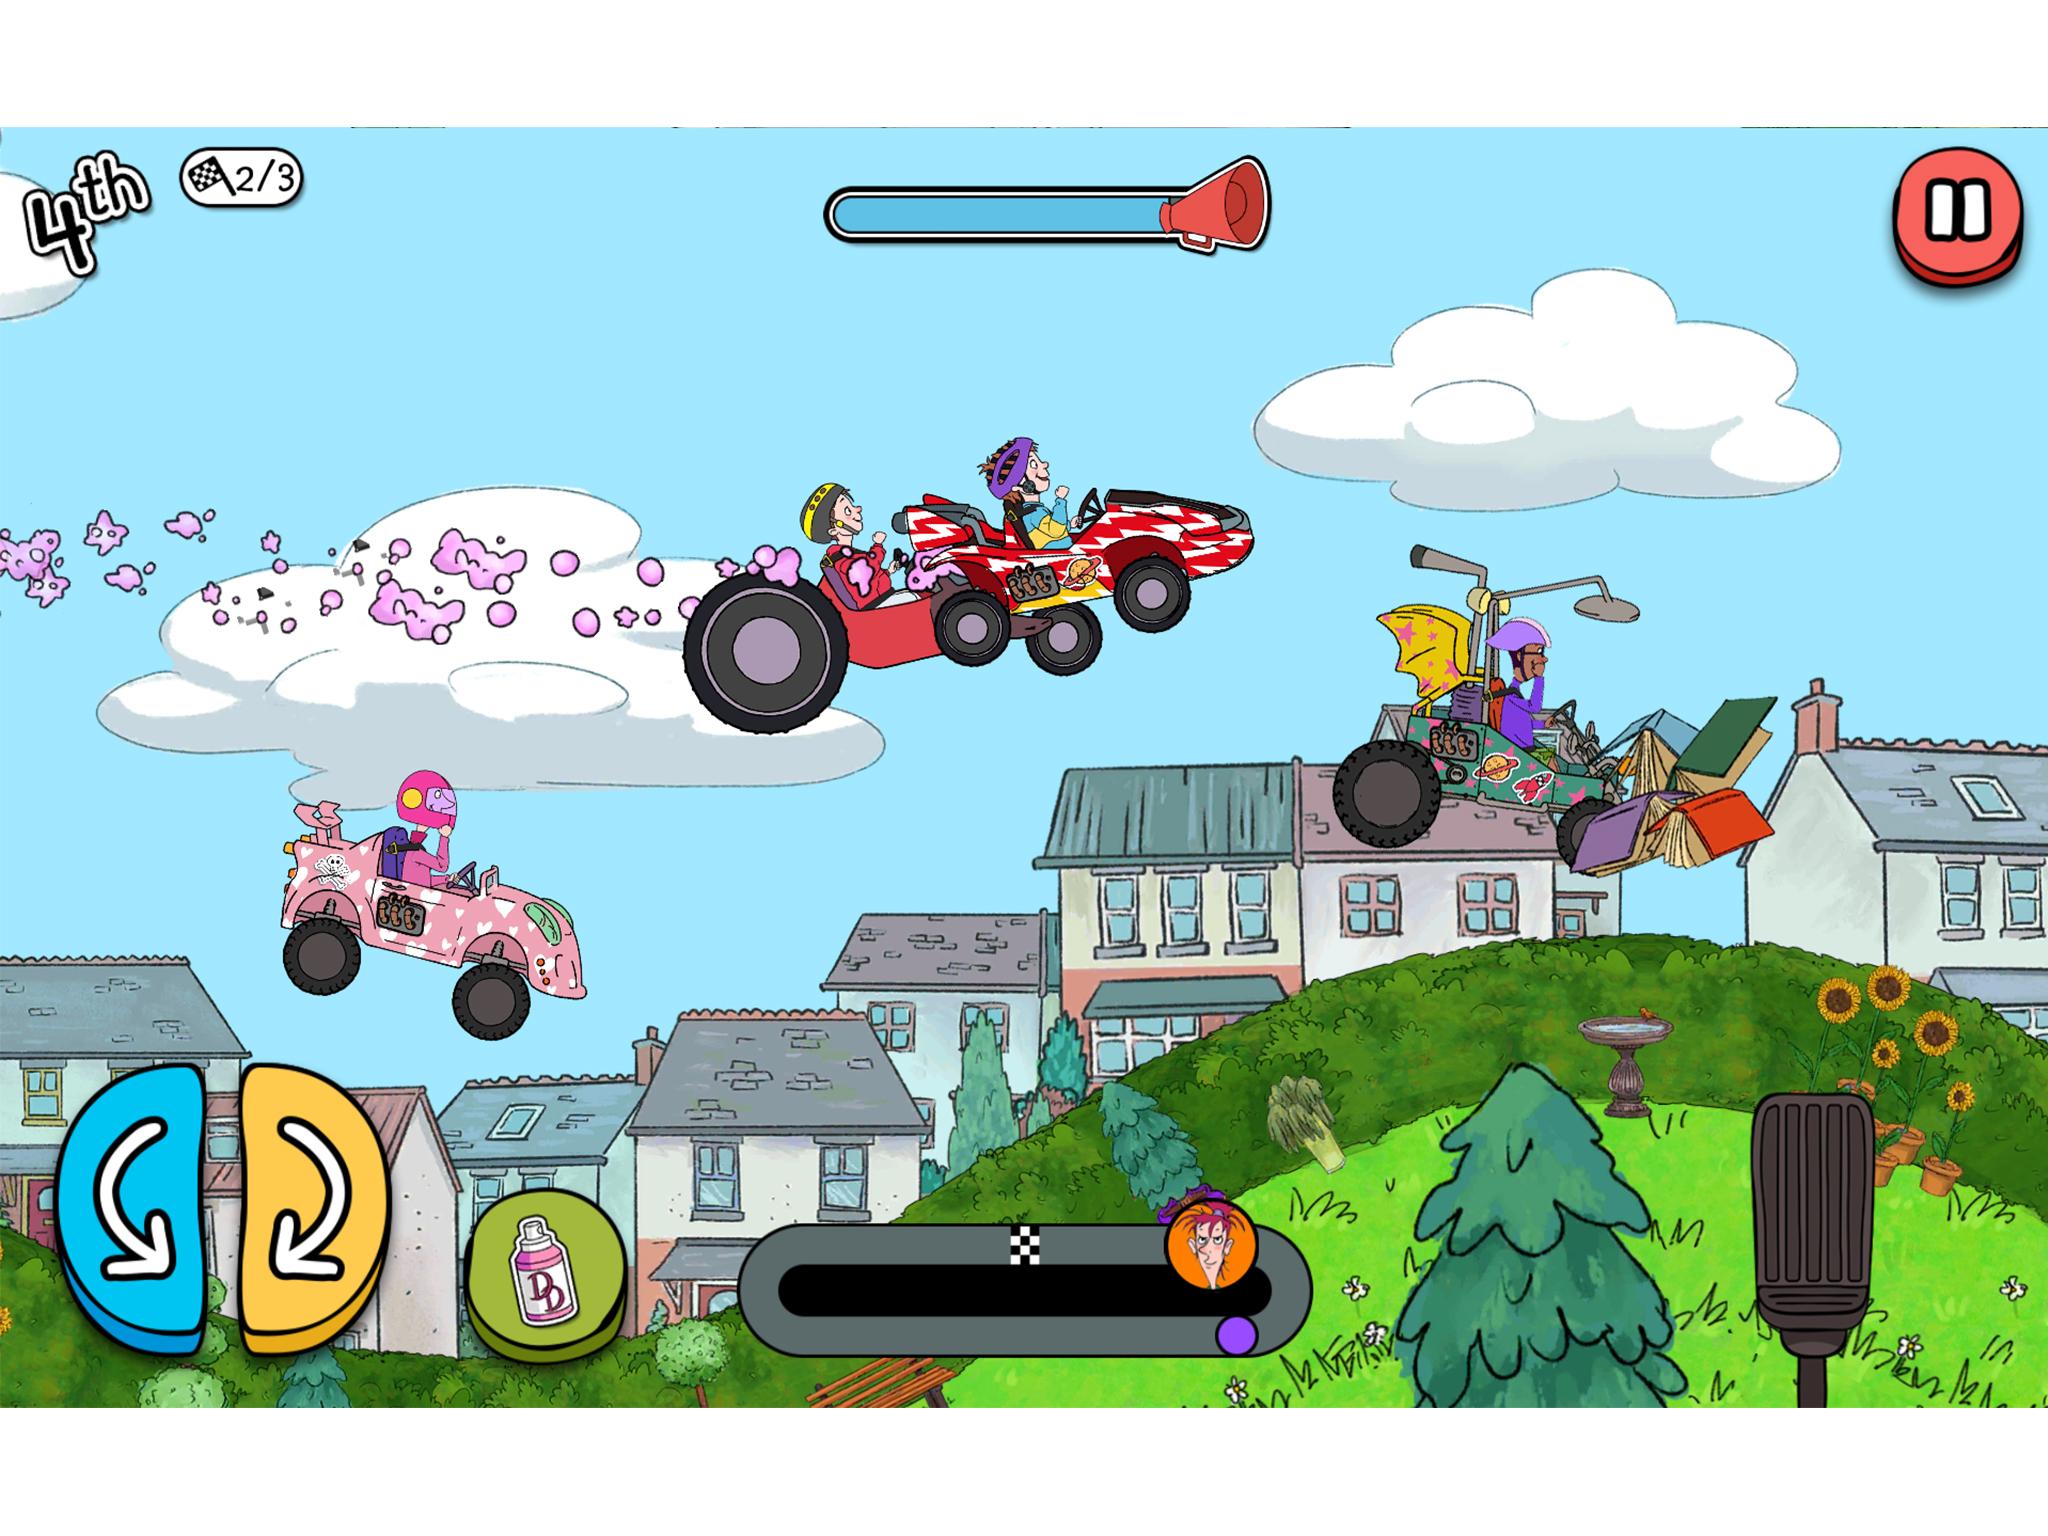 Bob the Builder's Playtime Fun! app